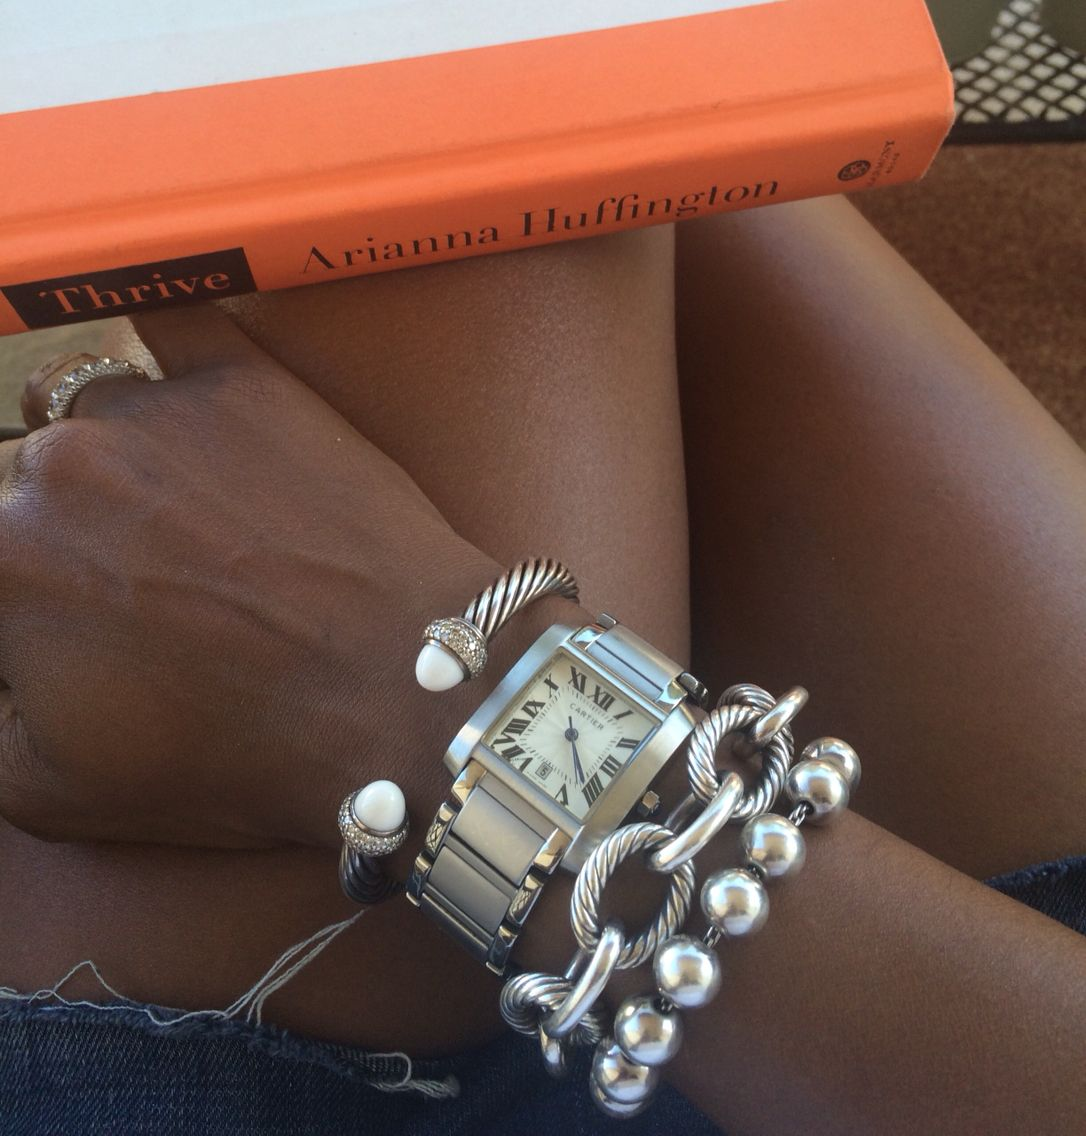 Bracelet vintage cuff cartier